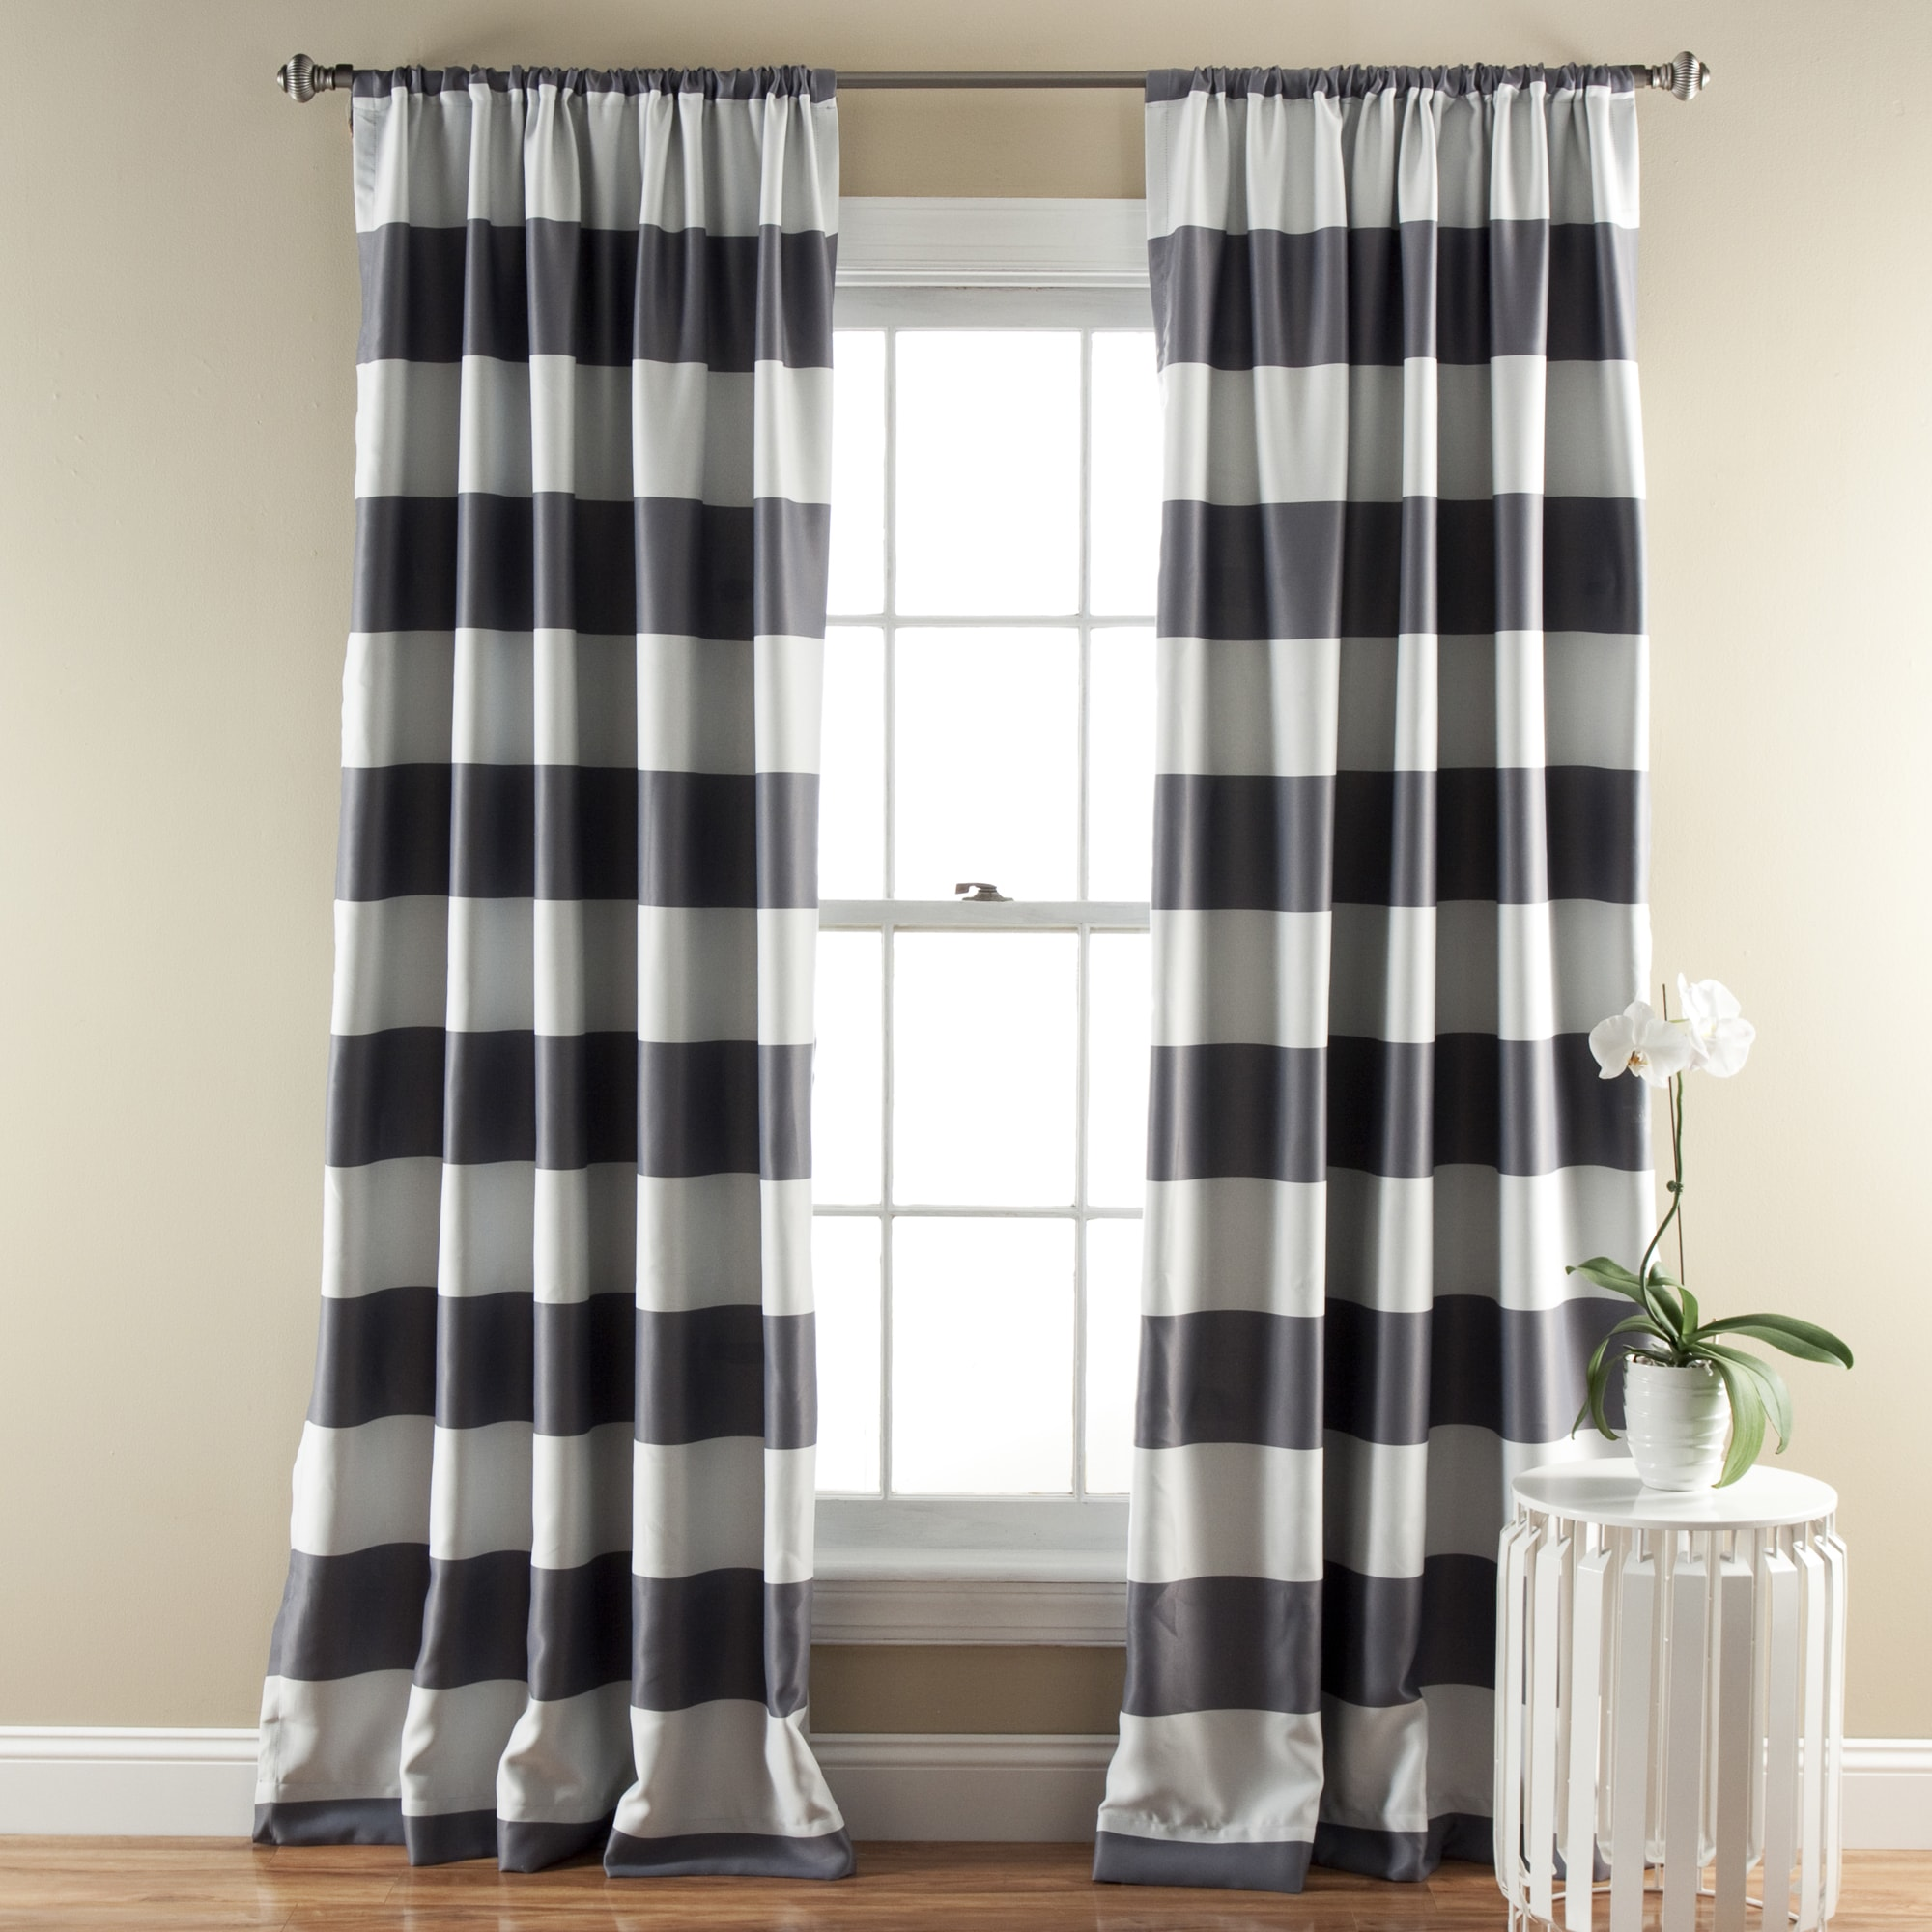 Shop Lush Decor Horizontal Stripe Room Darkening 84 Inch